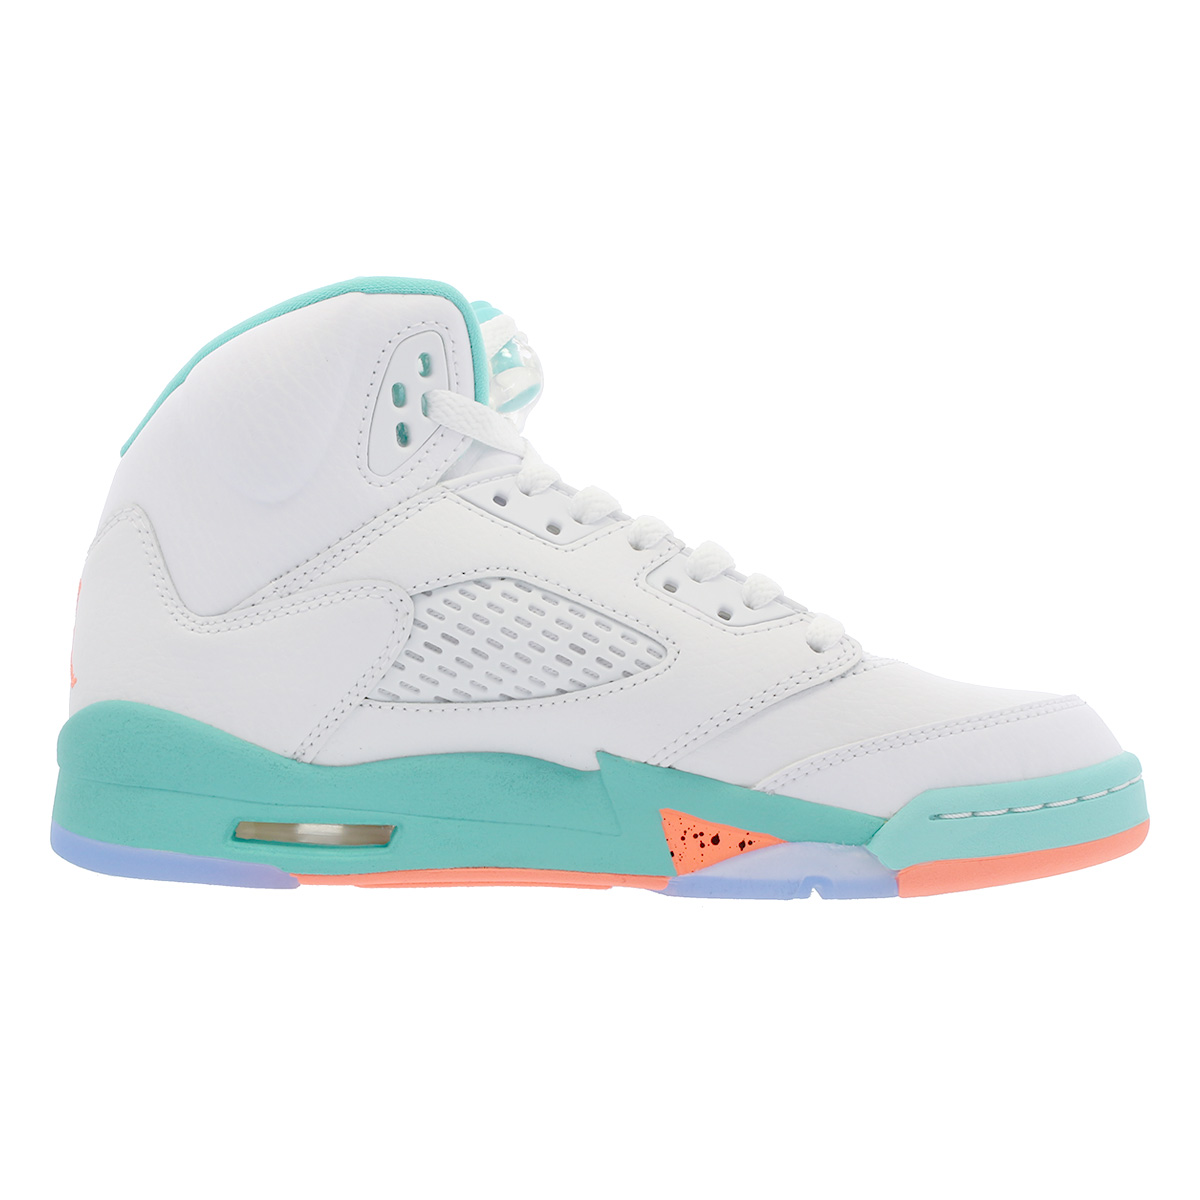 competitive price 0781c 6f08c NIKE AIR JORDAN 5 RETRO GG Nike air Jordan 5 nostalgic GG WHITE/CRIMSON  PULSE/LIGHT AQUA/BLACK